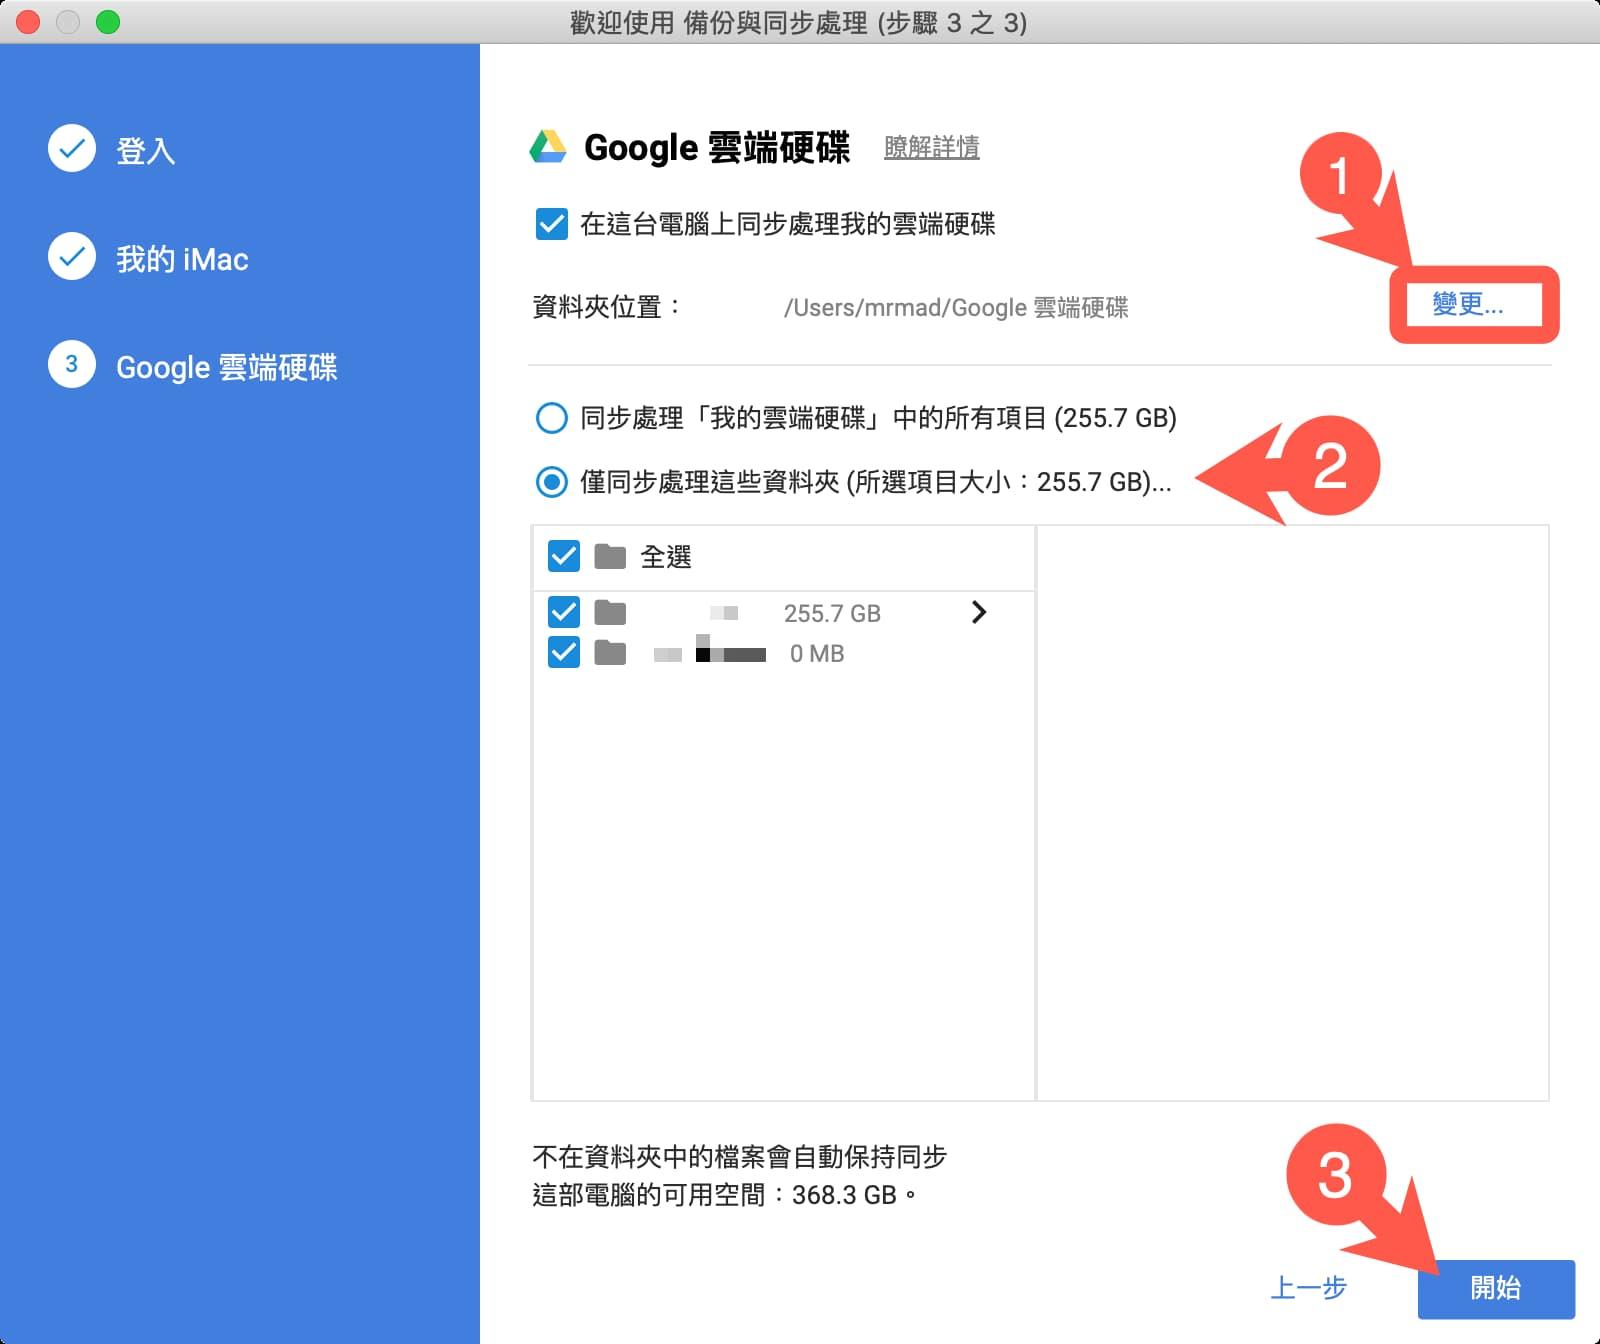 Google雲端硬碟批次下載、同步怎麼用?教你一鍵快速下載